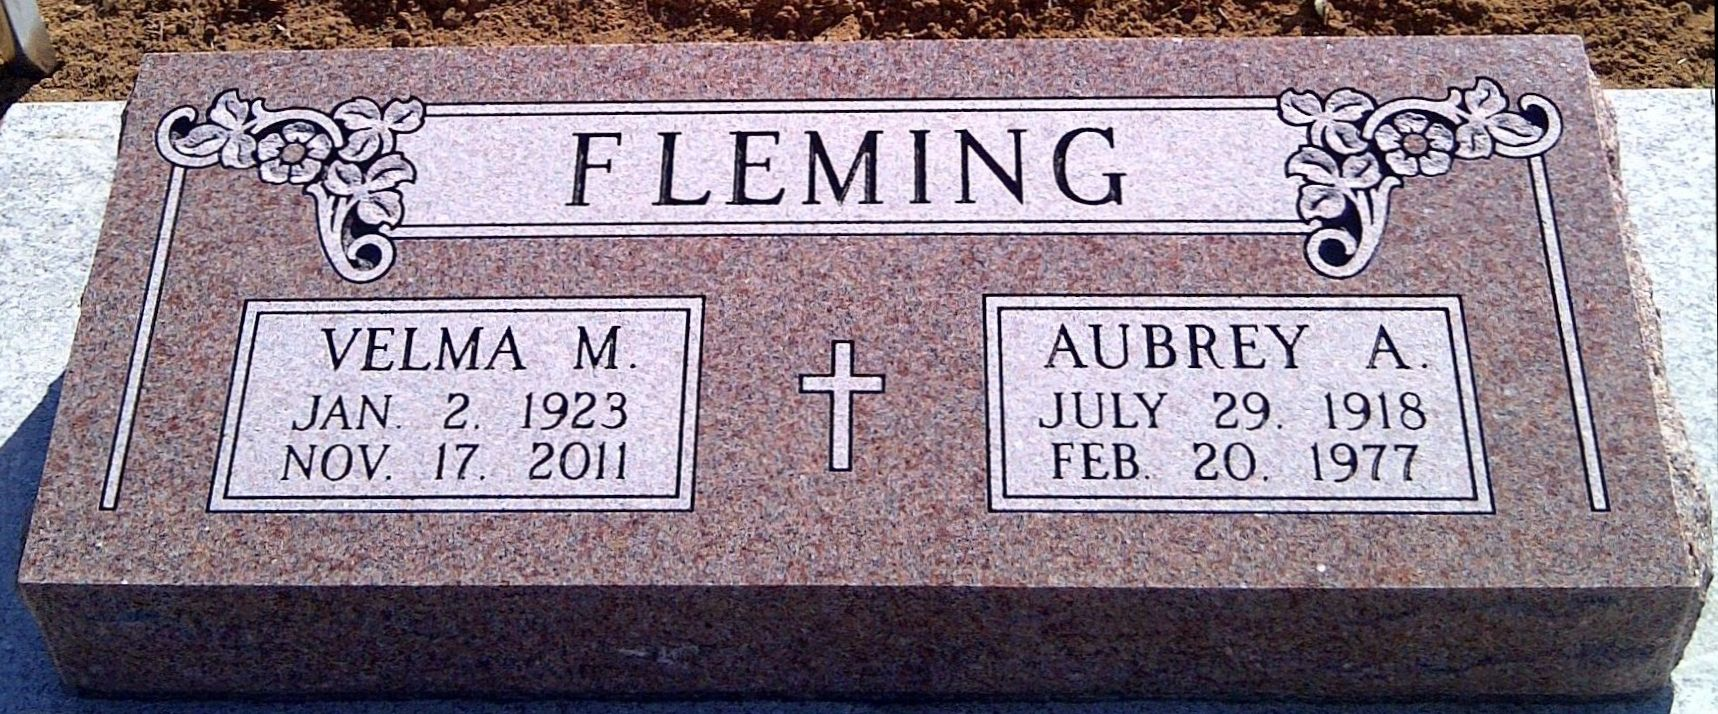 Fleming stone.jpg